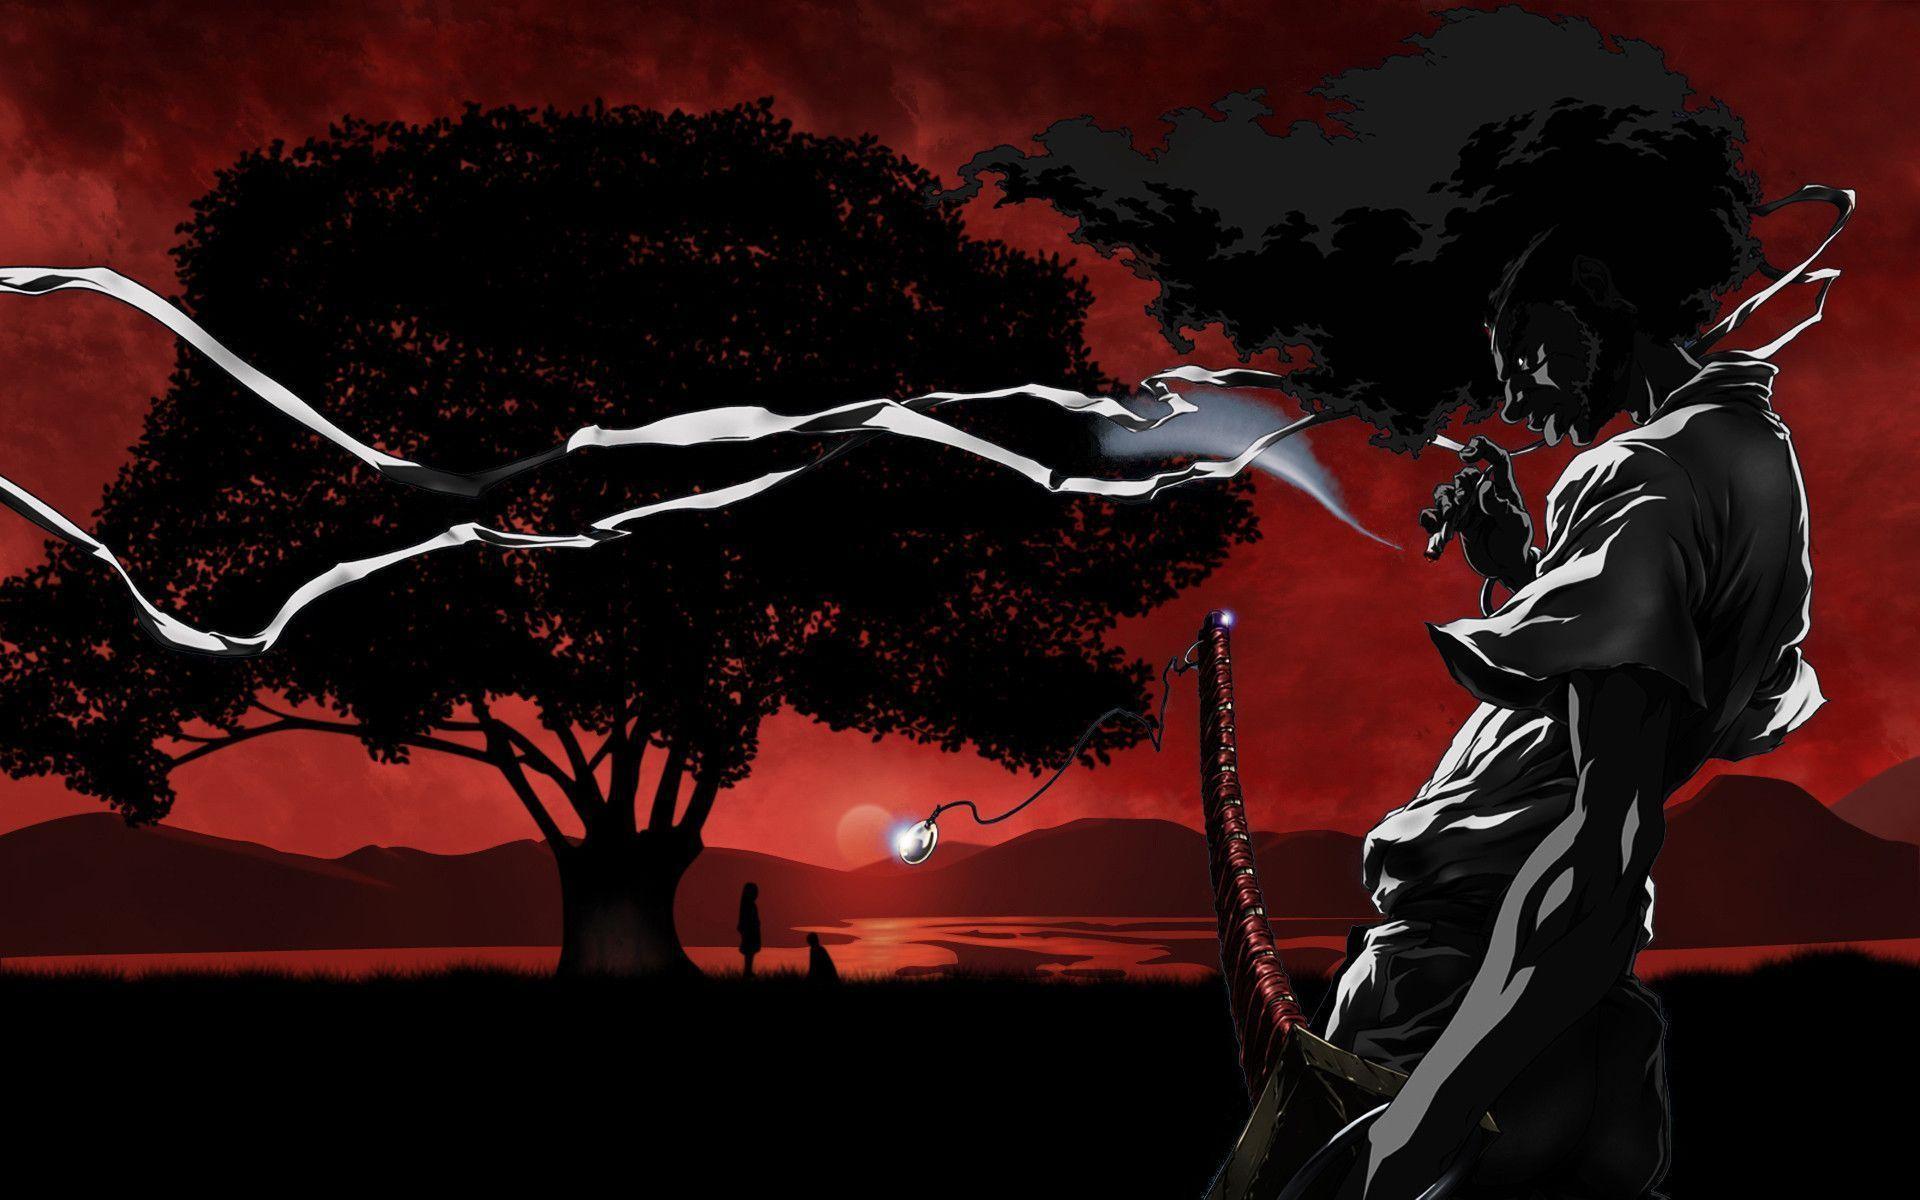 Afro Samurai Wallpaper 1920x1080 Free Download